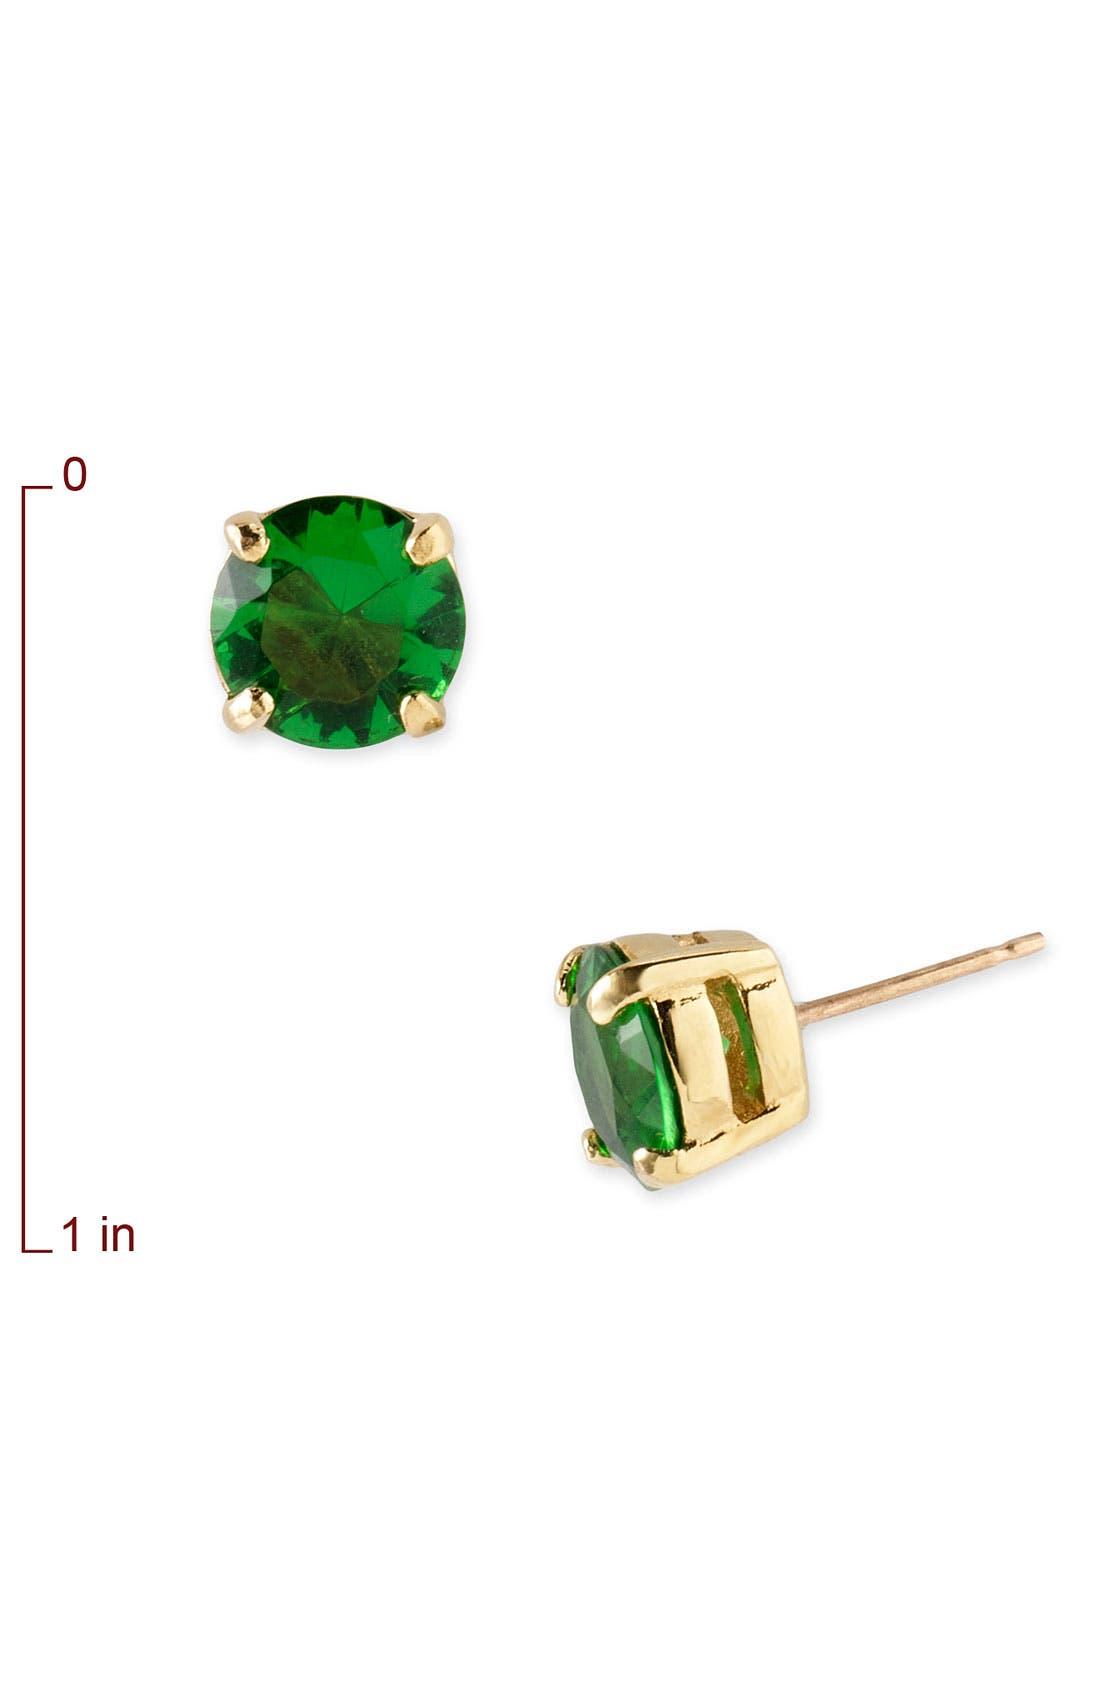 KATE SPADE NEW YORK,                             'cueva rosa' stud earrings,                             Alternate thumbnail 2, color,                             300